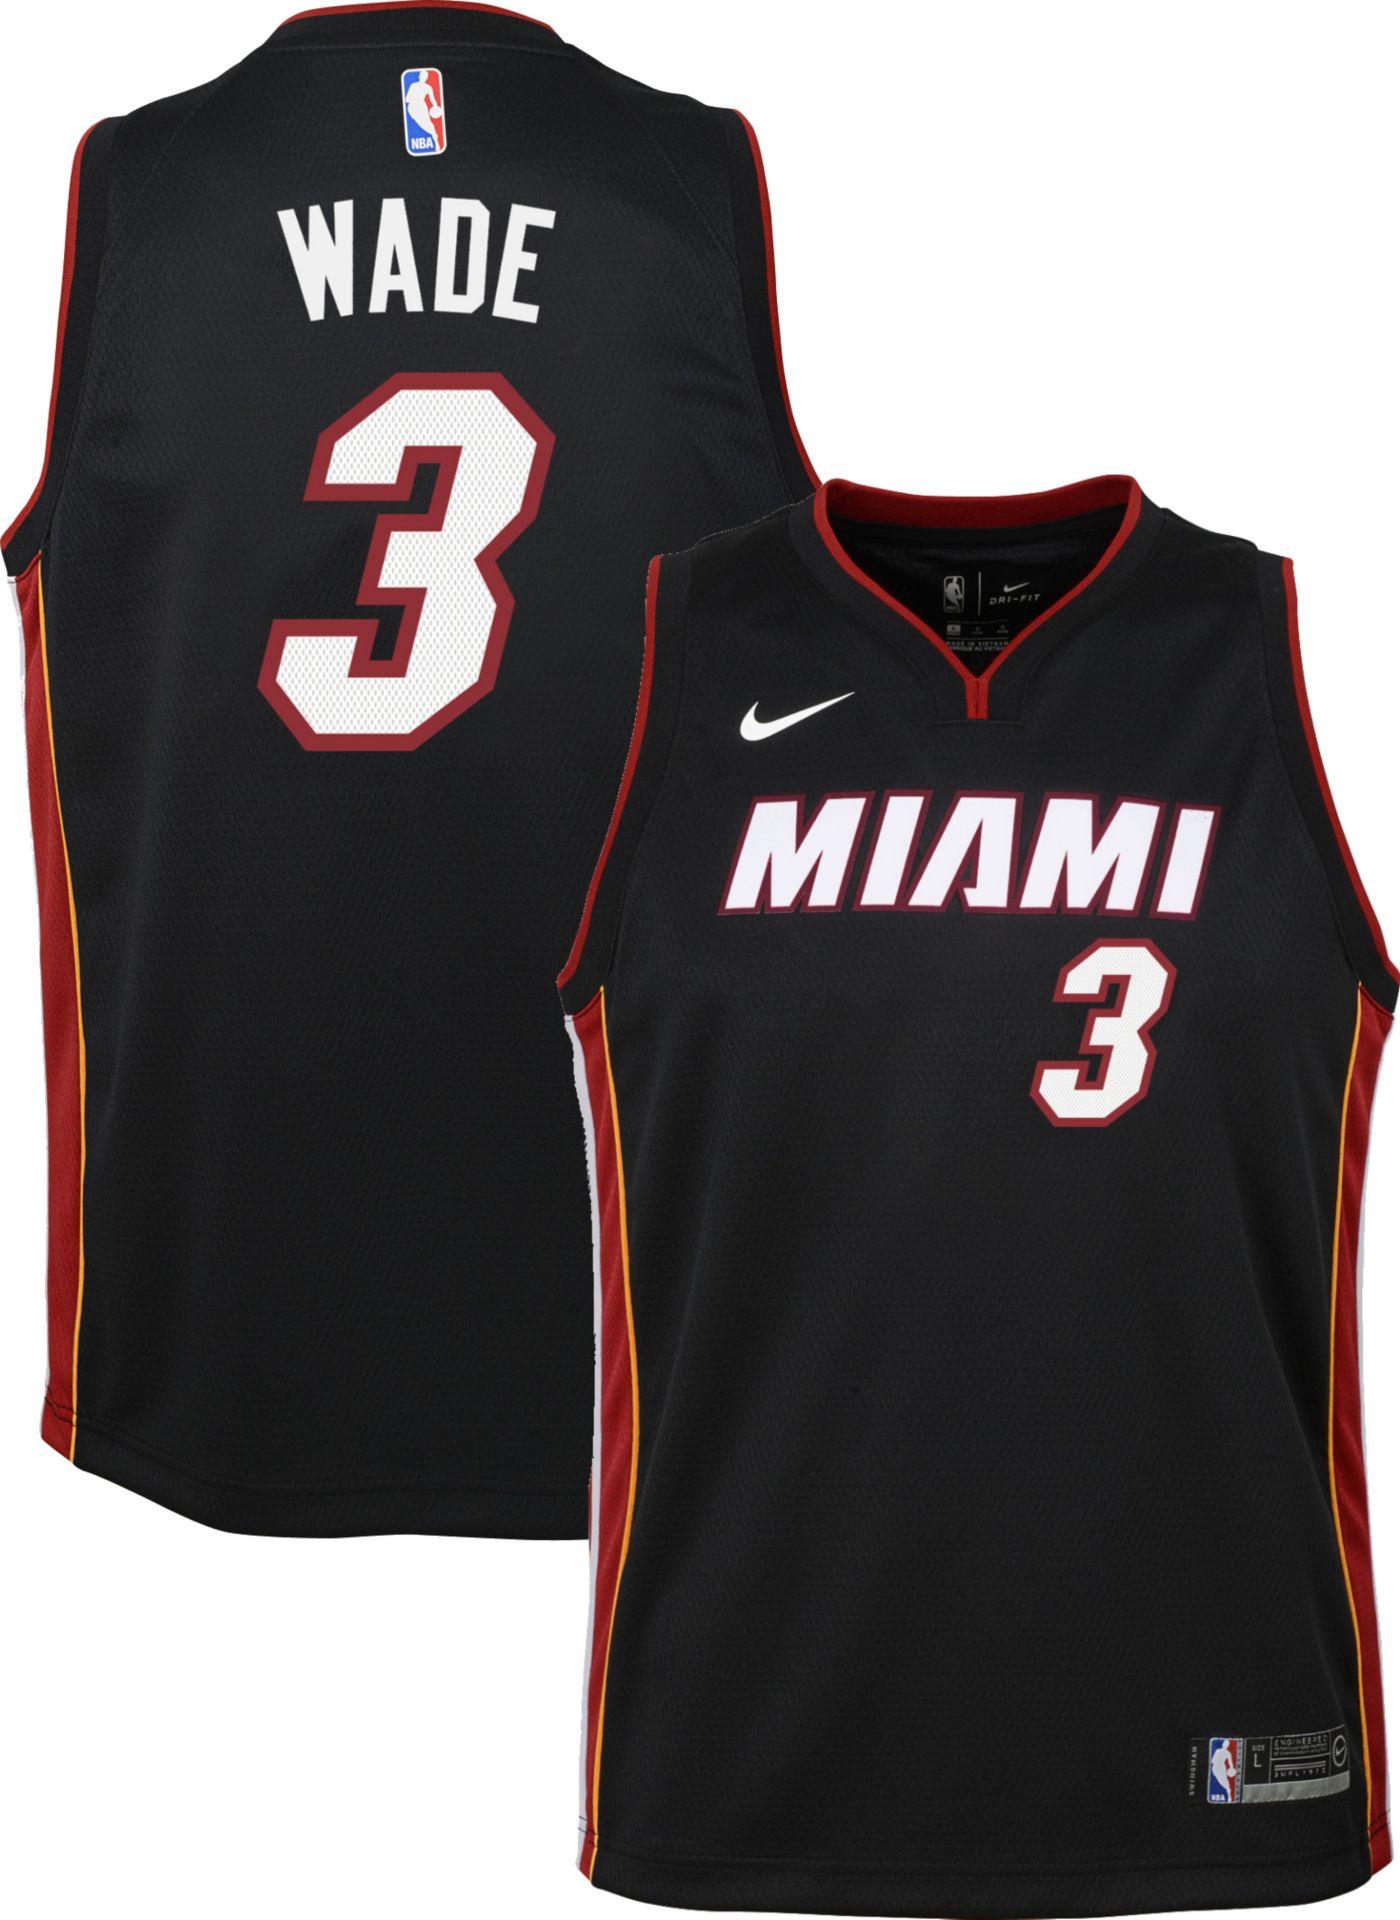 Nike Youth Miami Heat Dwyane Wade #3 Black Dri-FIT Swingman Jersey